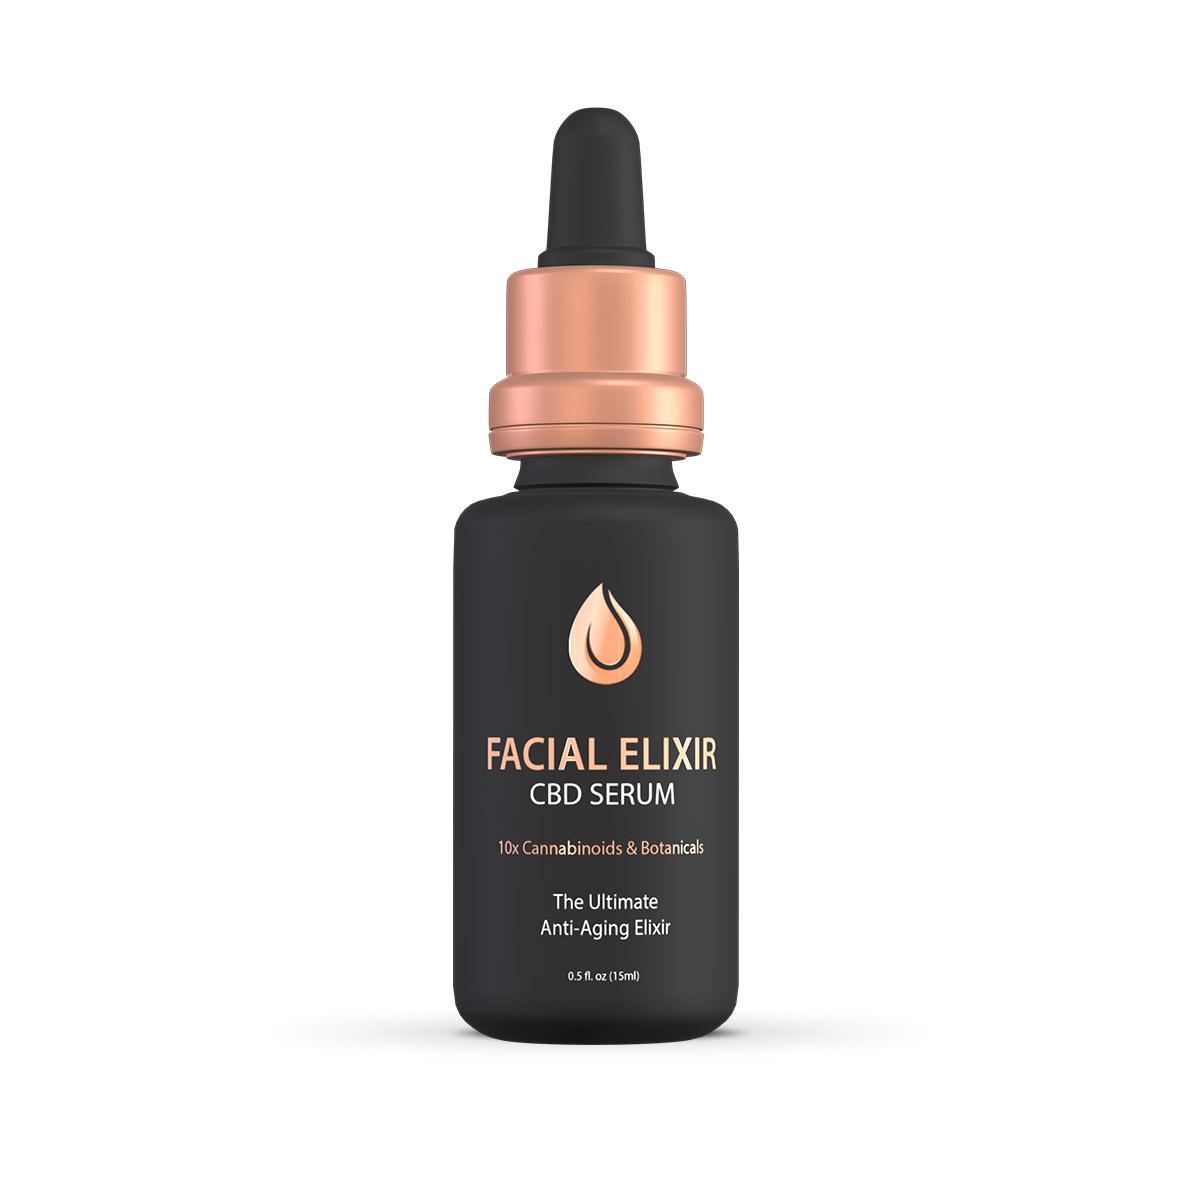 pavate-black-label-cbd-serum-facial-elixir